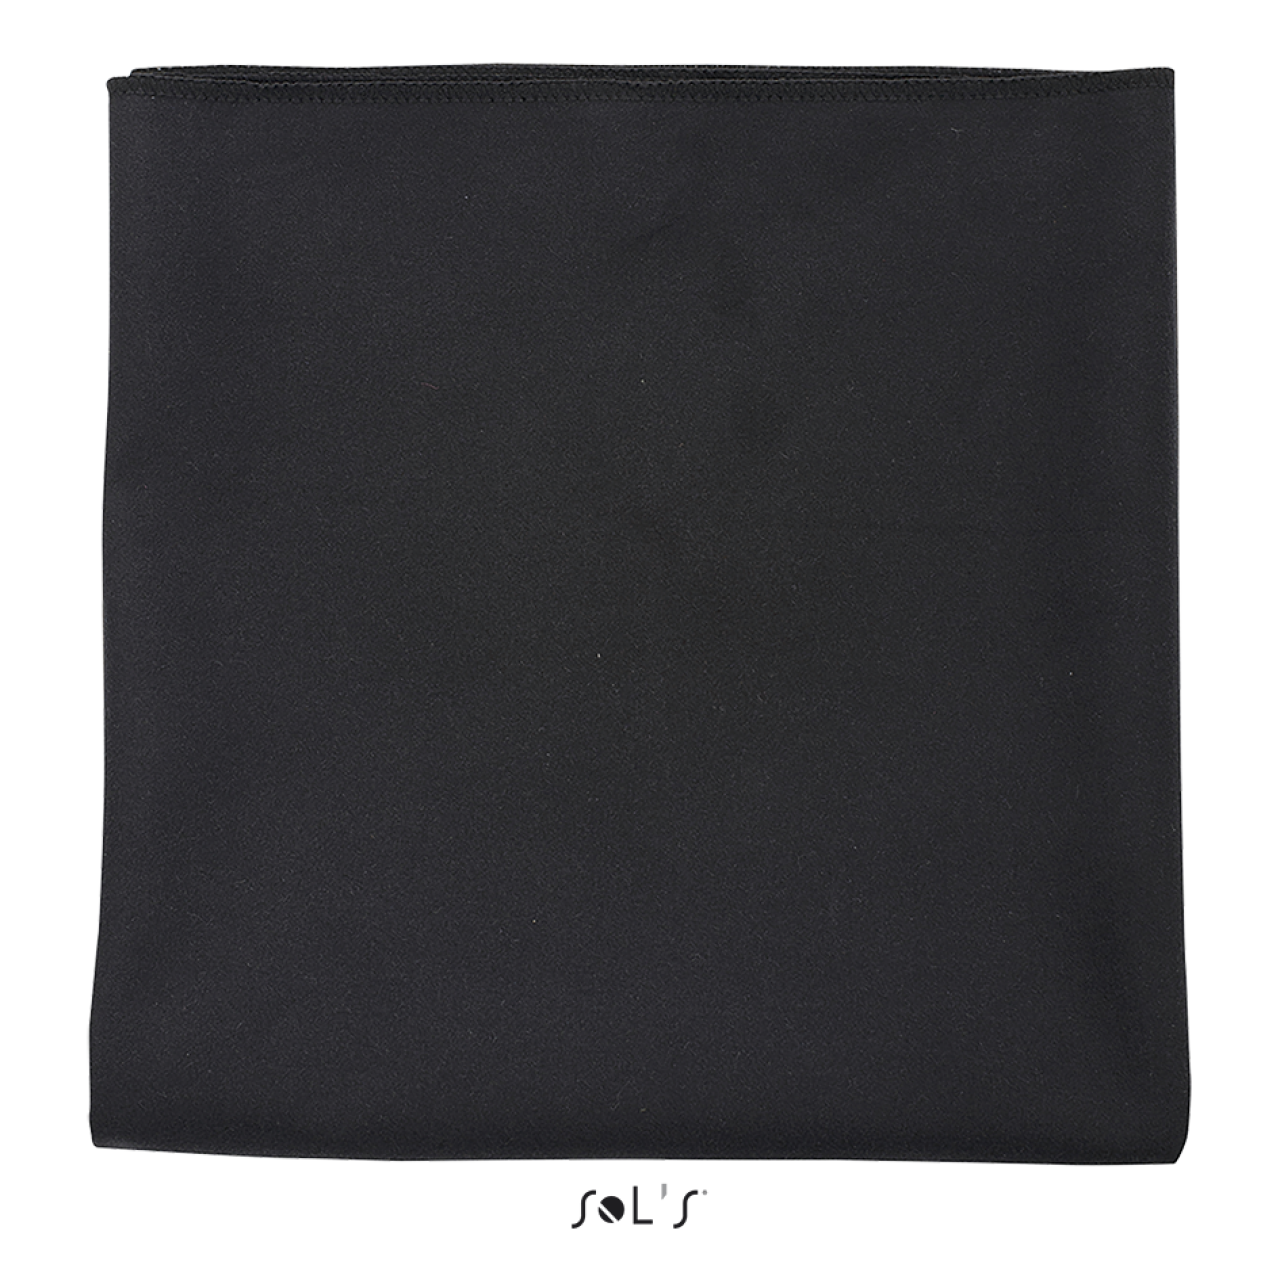 ATOLL 30 - MICROFIBRE TOWEL